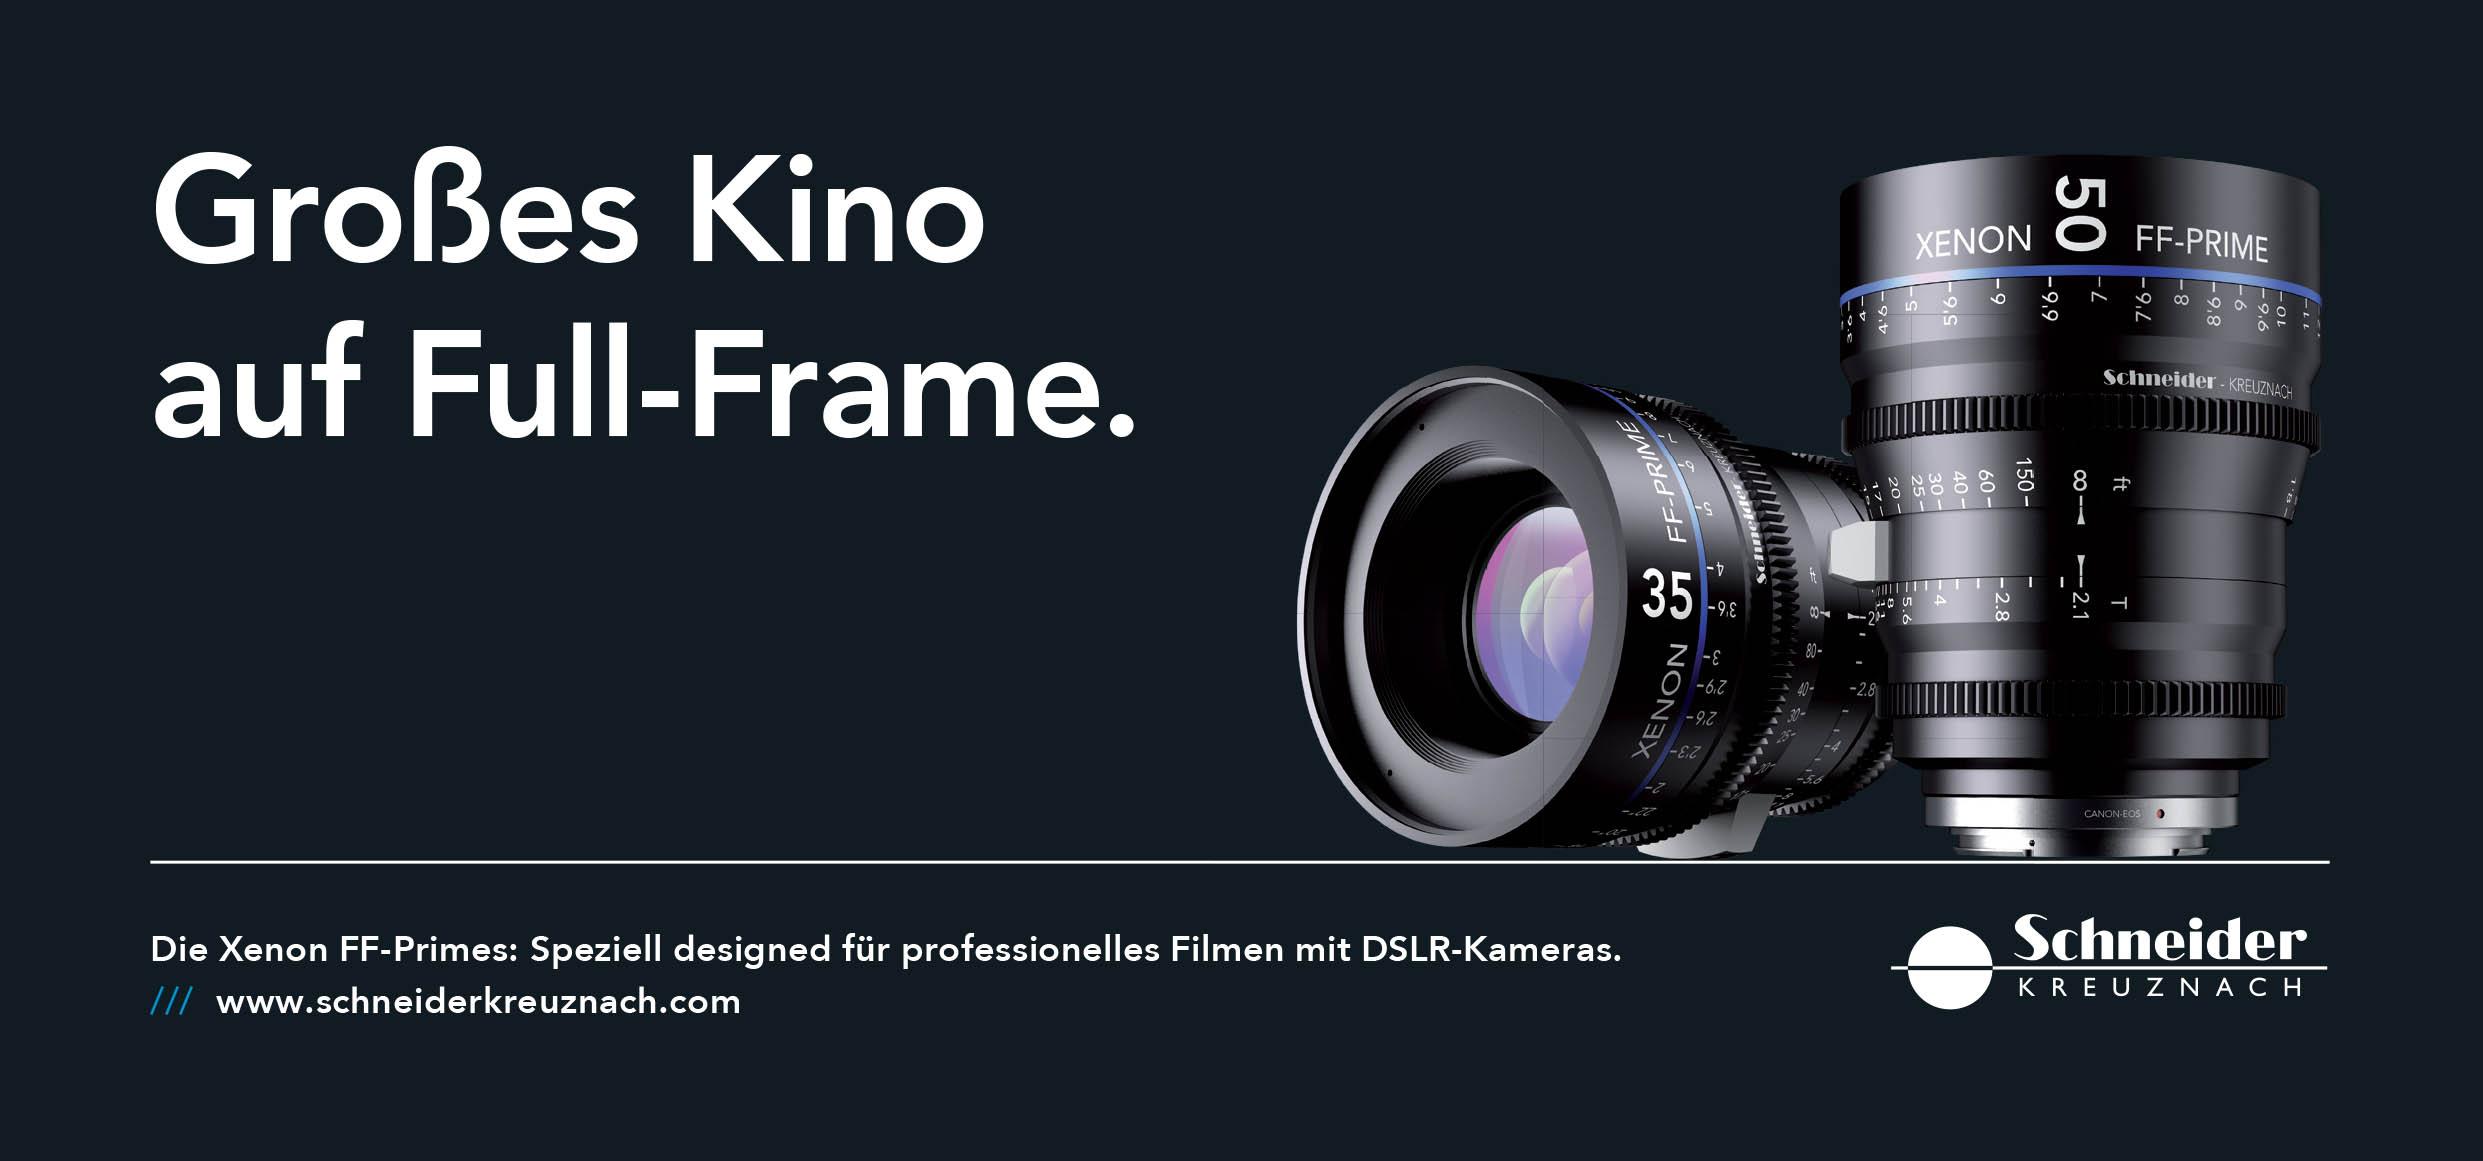 Schneider Kreuznach 施耐德 Xenon FF-Prime Lens 電影鏡頭